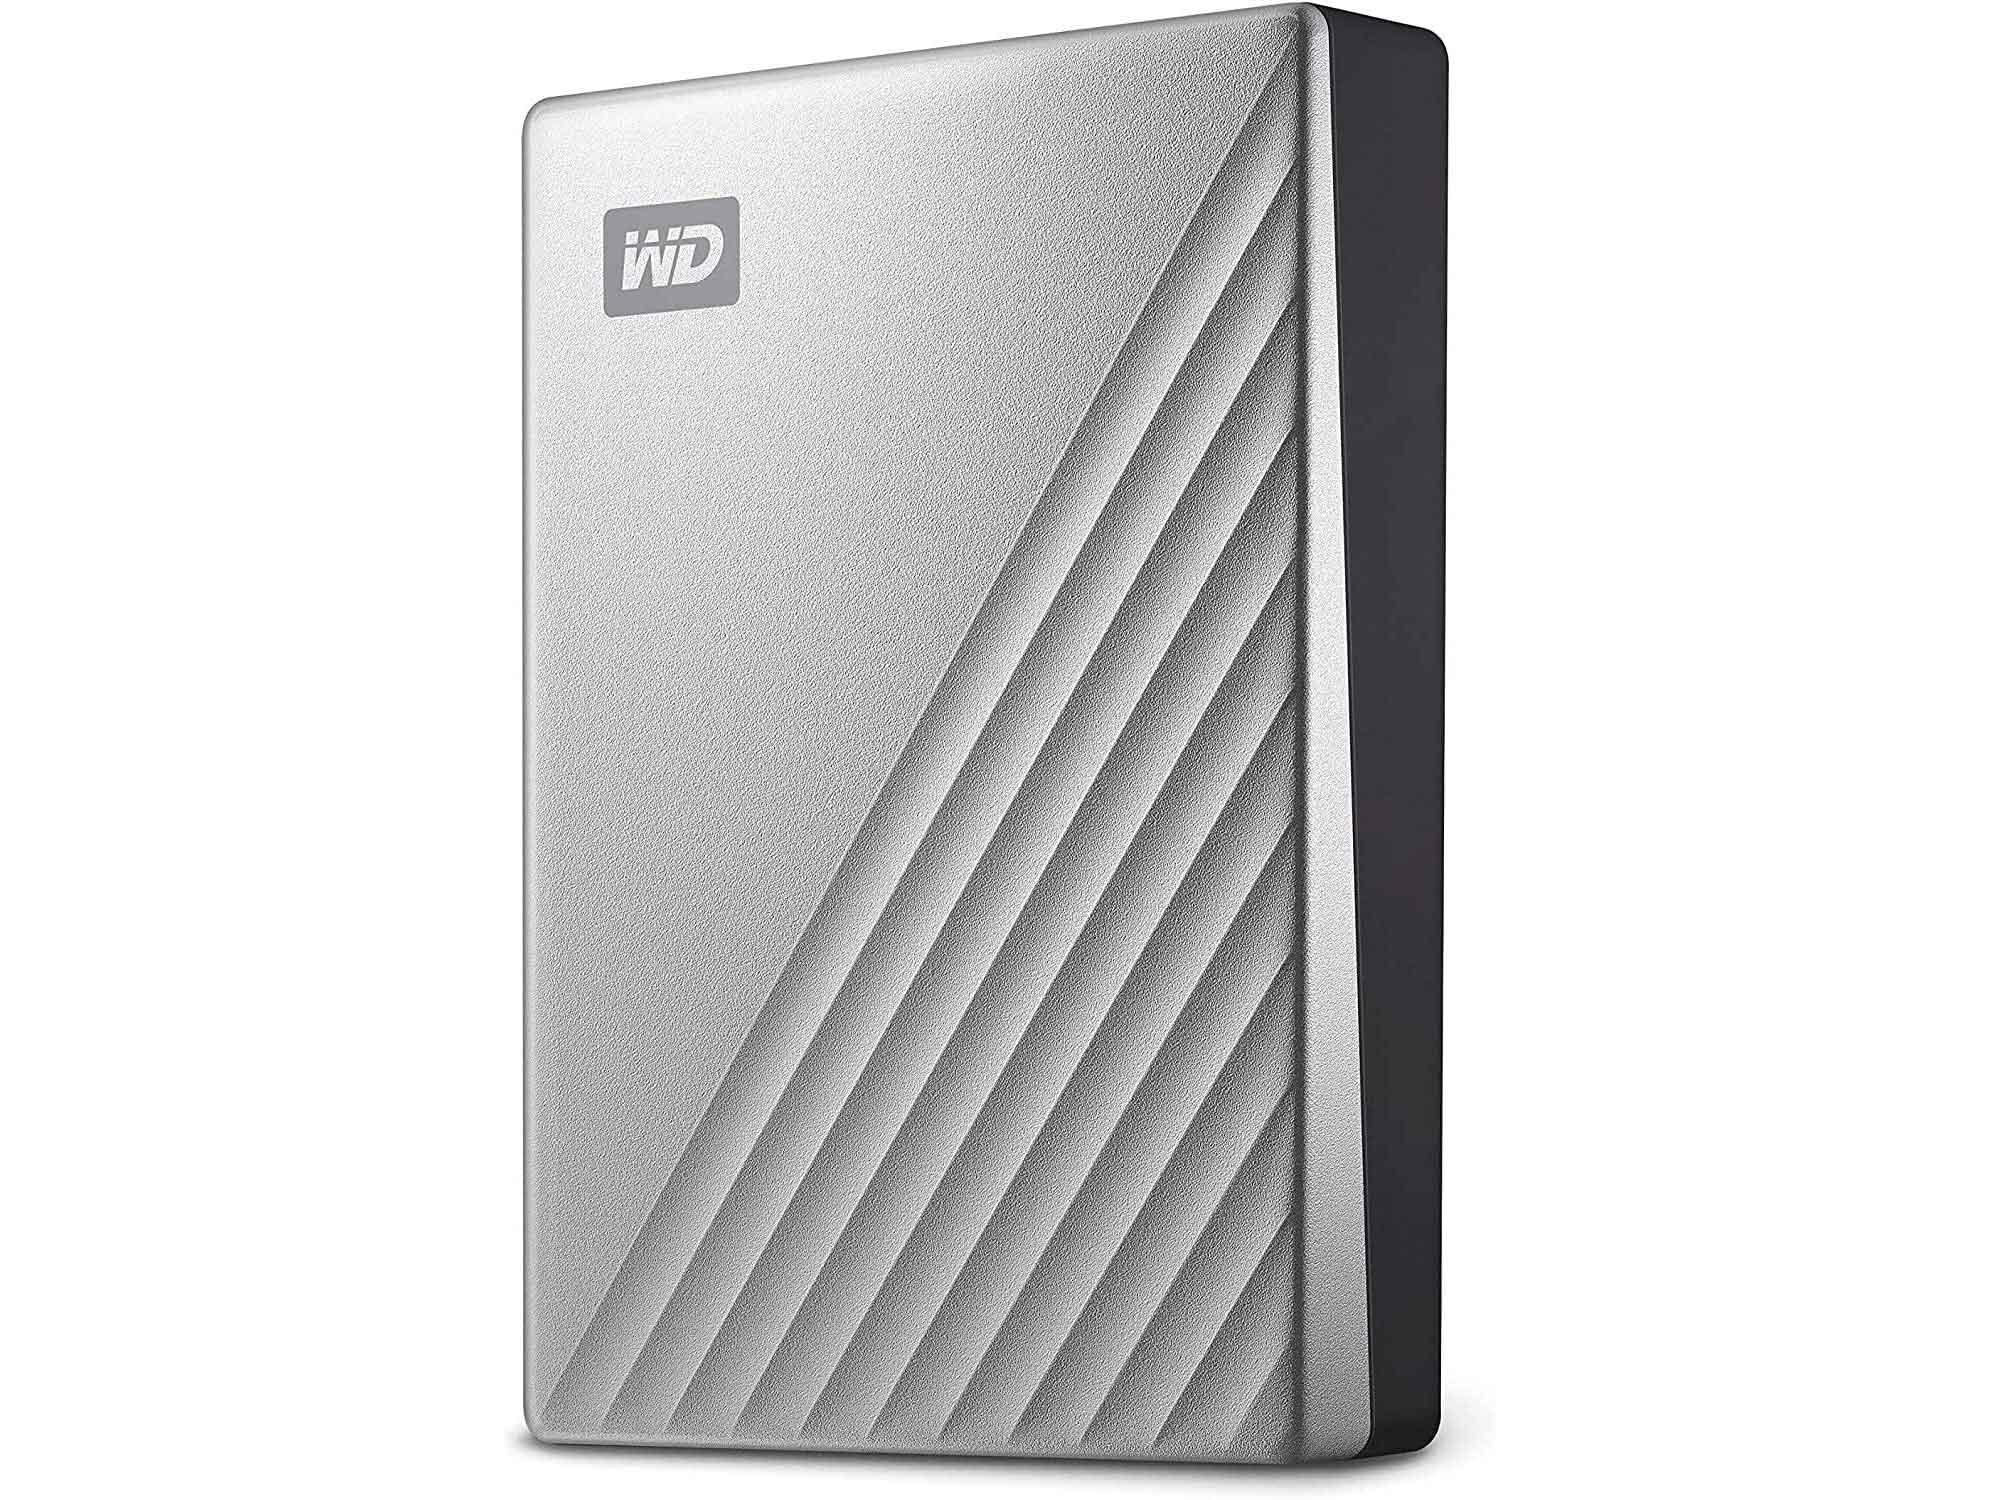 WD 4TB My Passport Ultra for Mac Silver Portable External Hard Drive